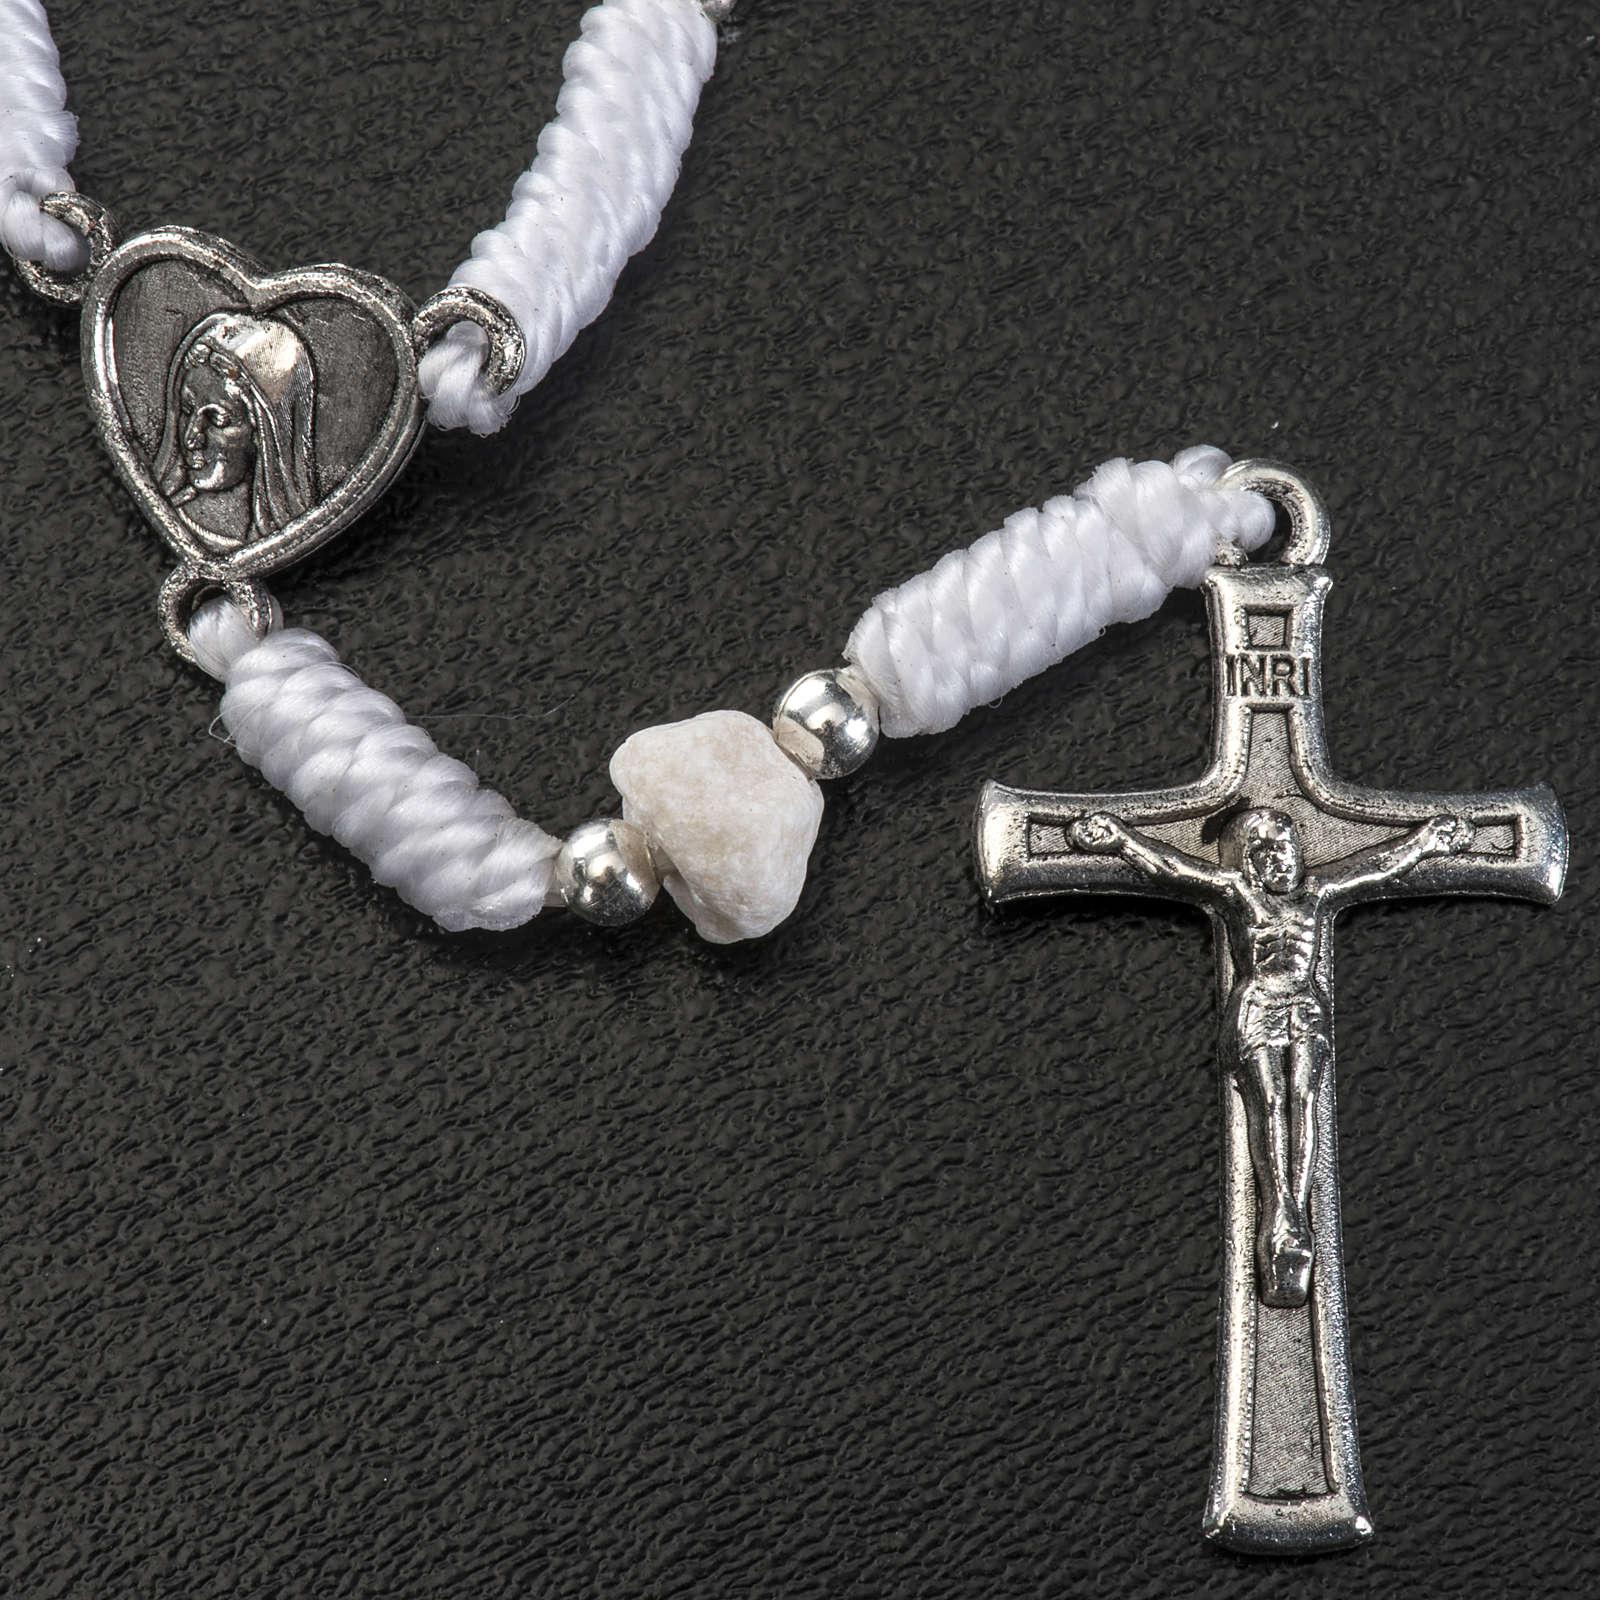 Dezena Medjugorje pedra fio branco medalha coração 4